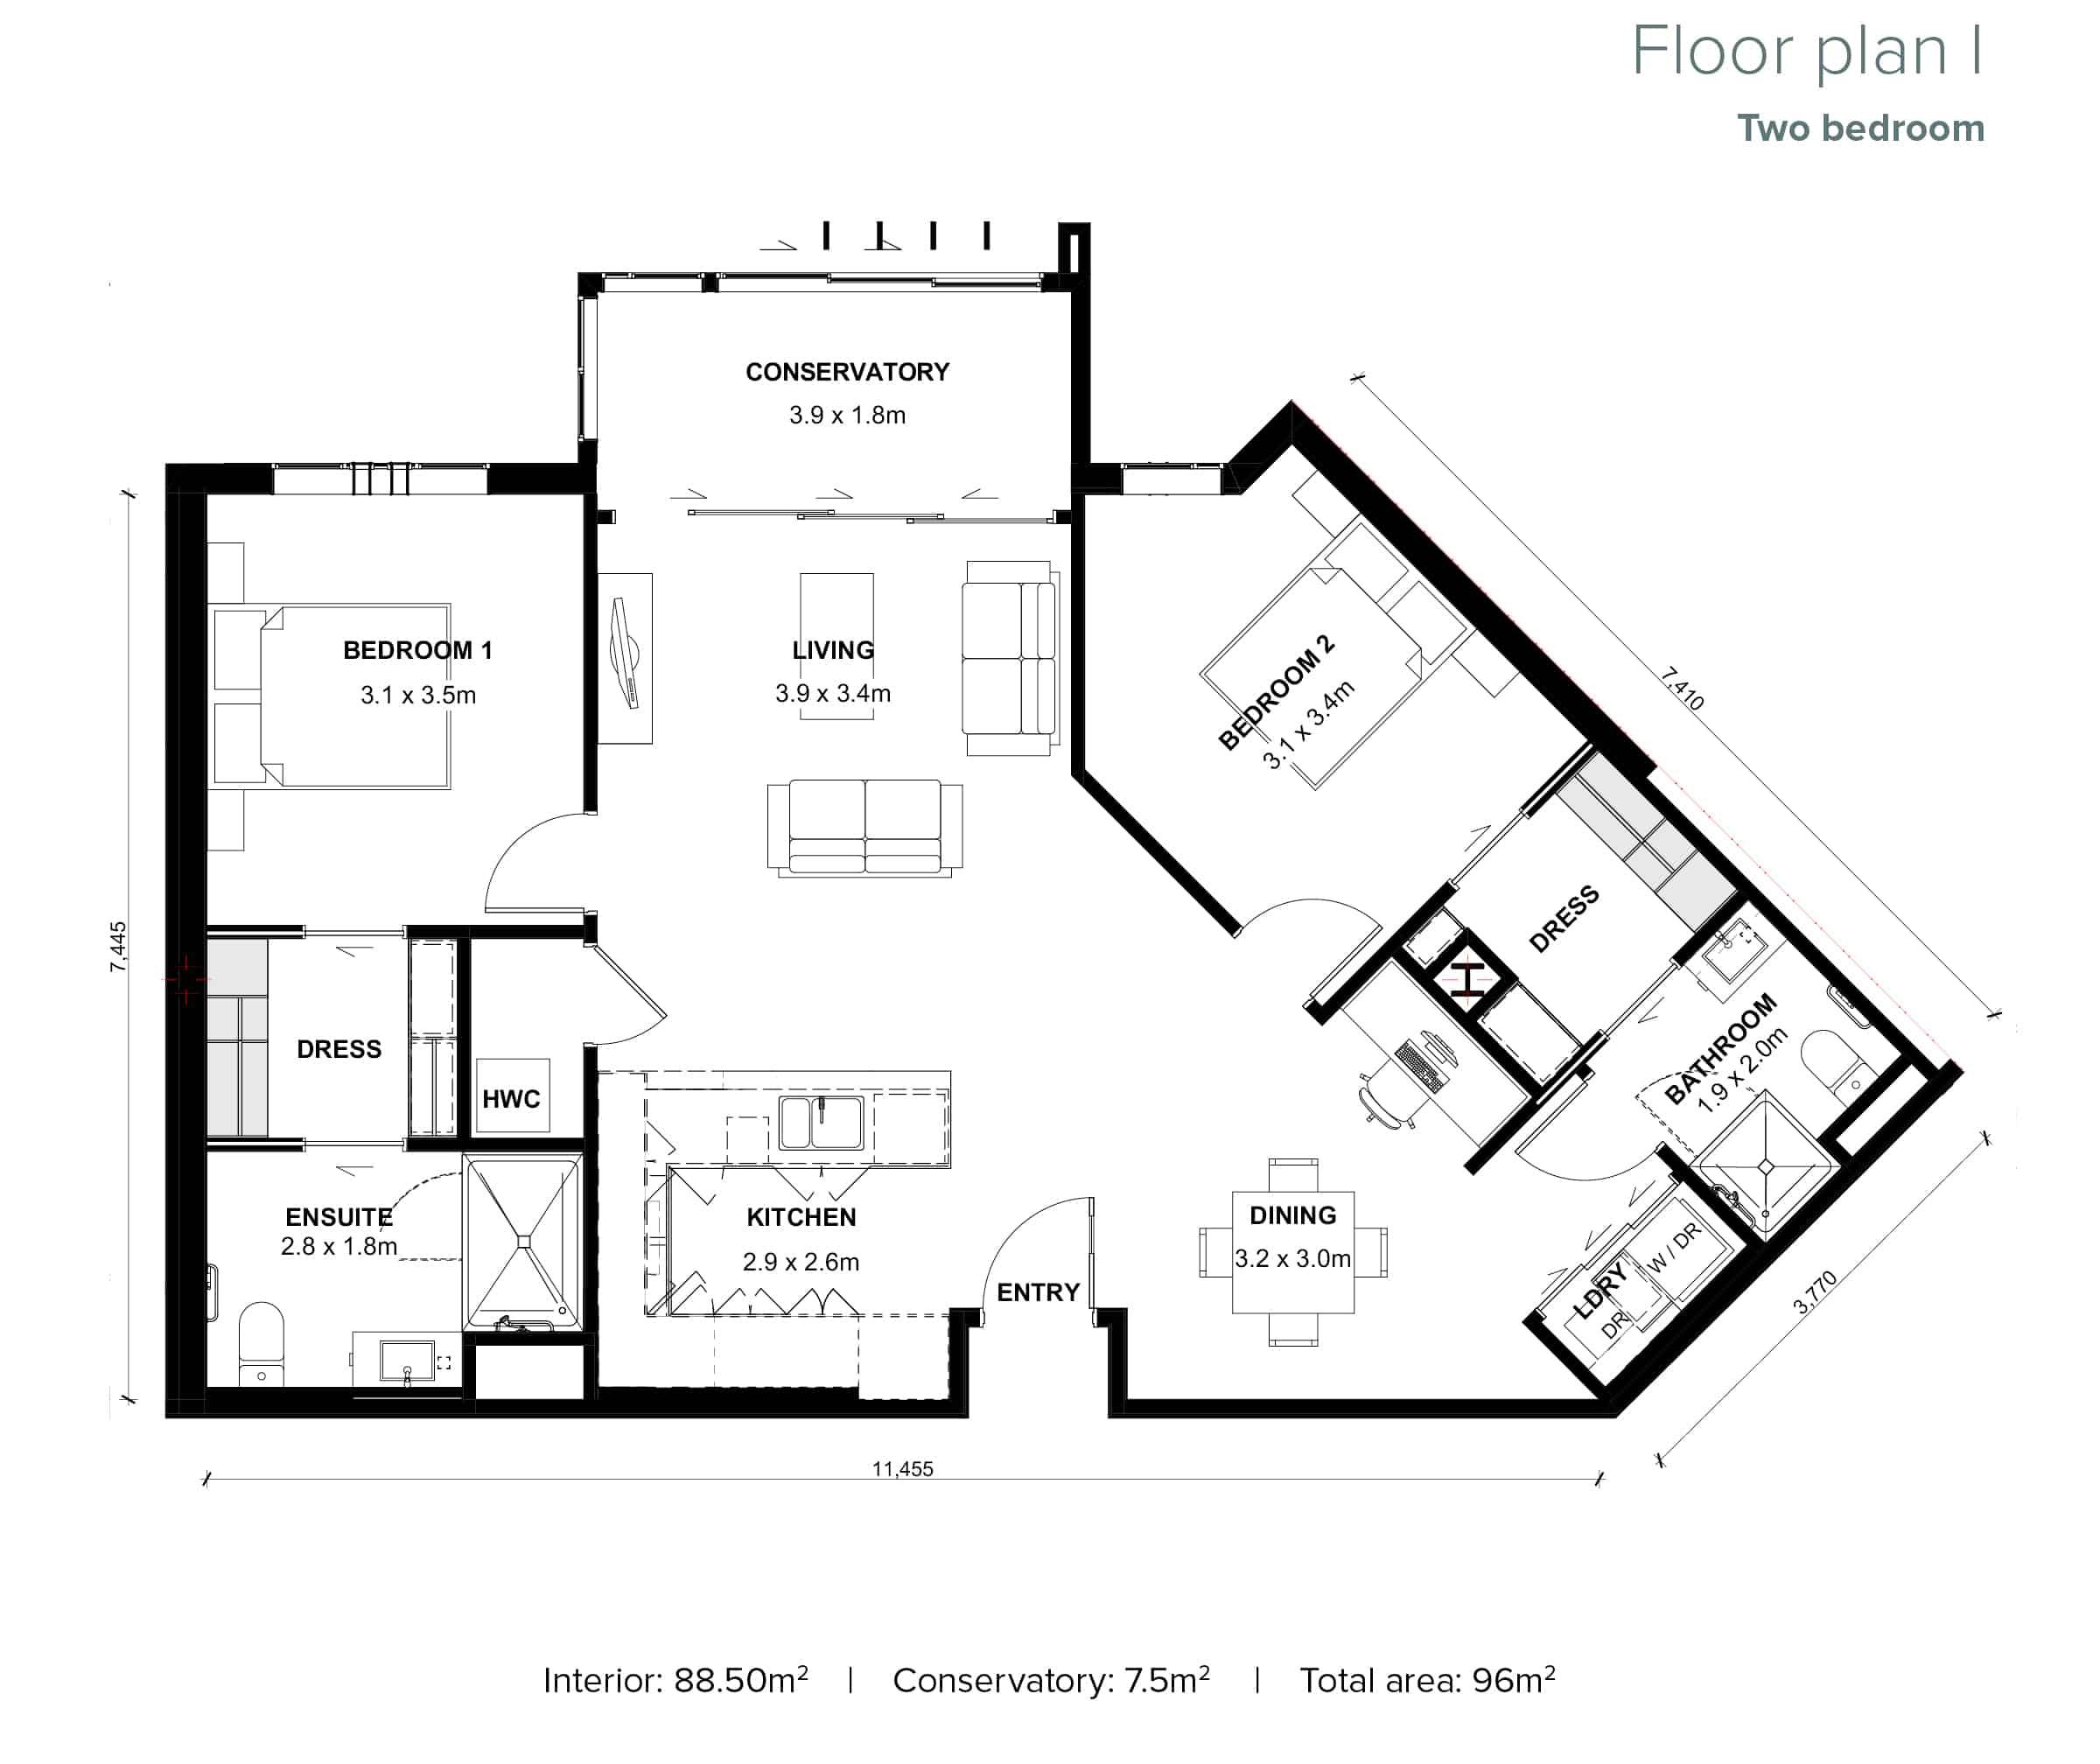 The Grove Orewa - Floor plan I - Two Bedroom